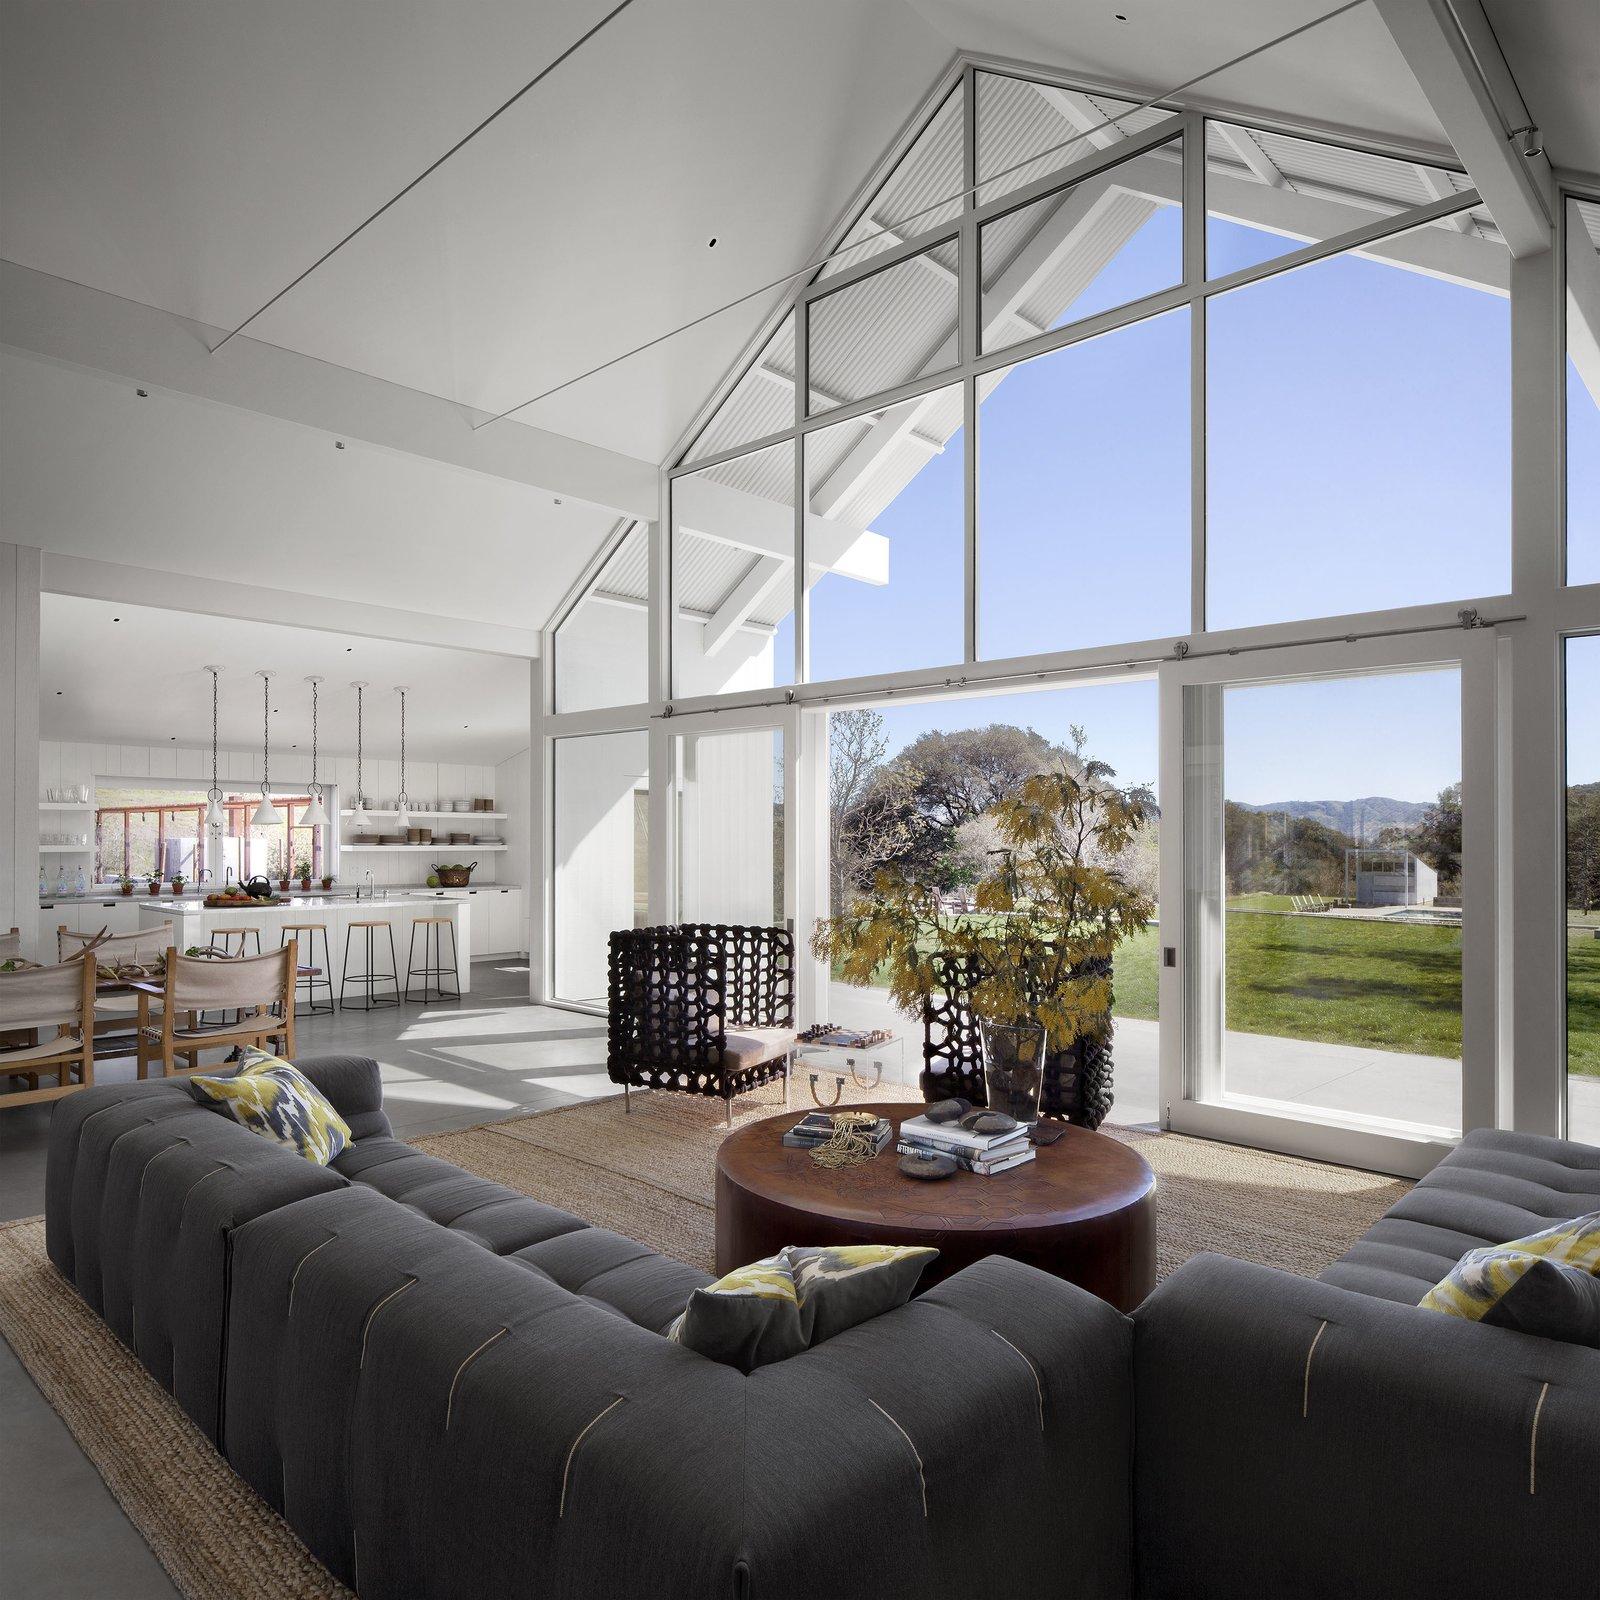 #TurnbullGriffinHaesloop #interior #livingroom #kitchen #window  Hupomone Ranch by Turnbull Griffin Haesloop Architects